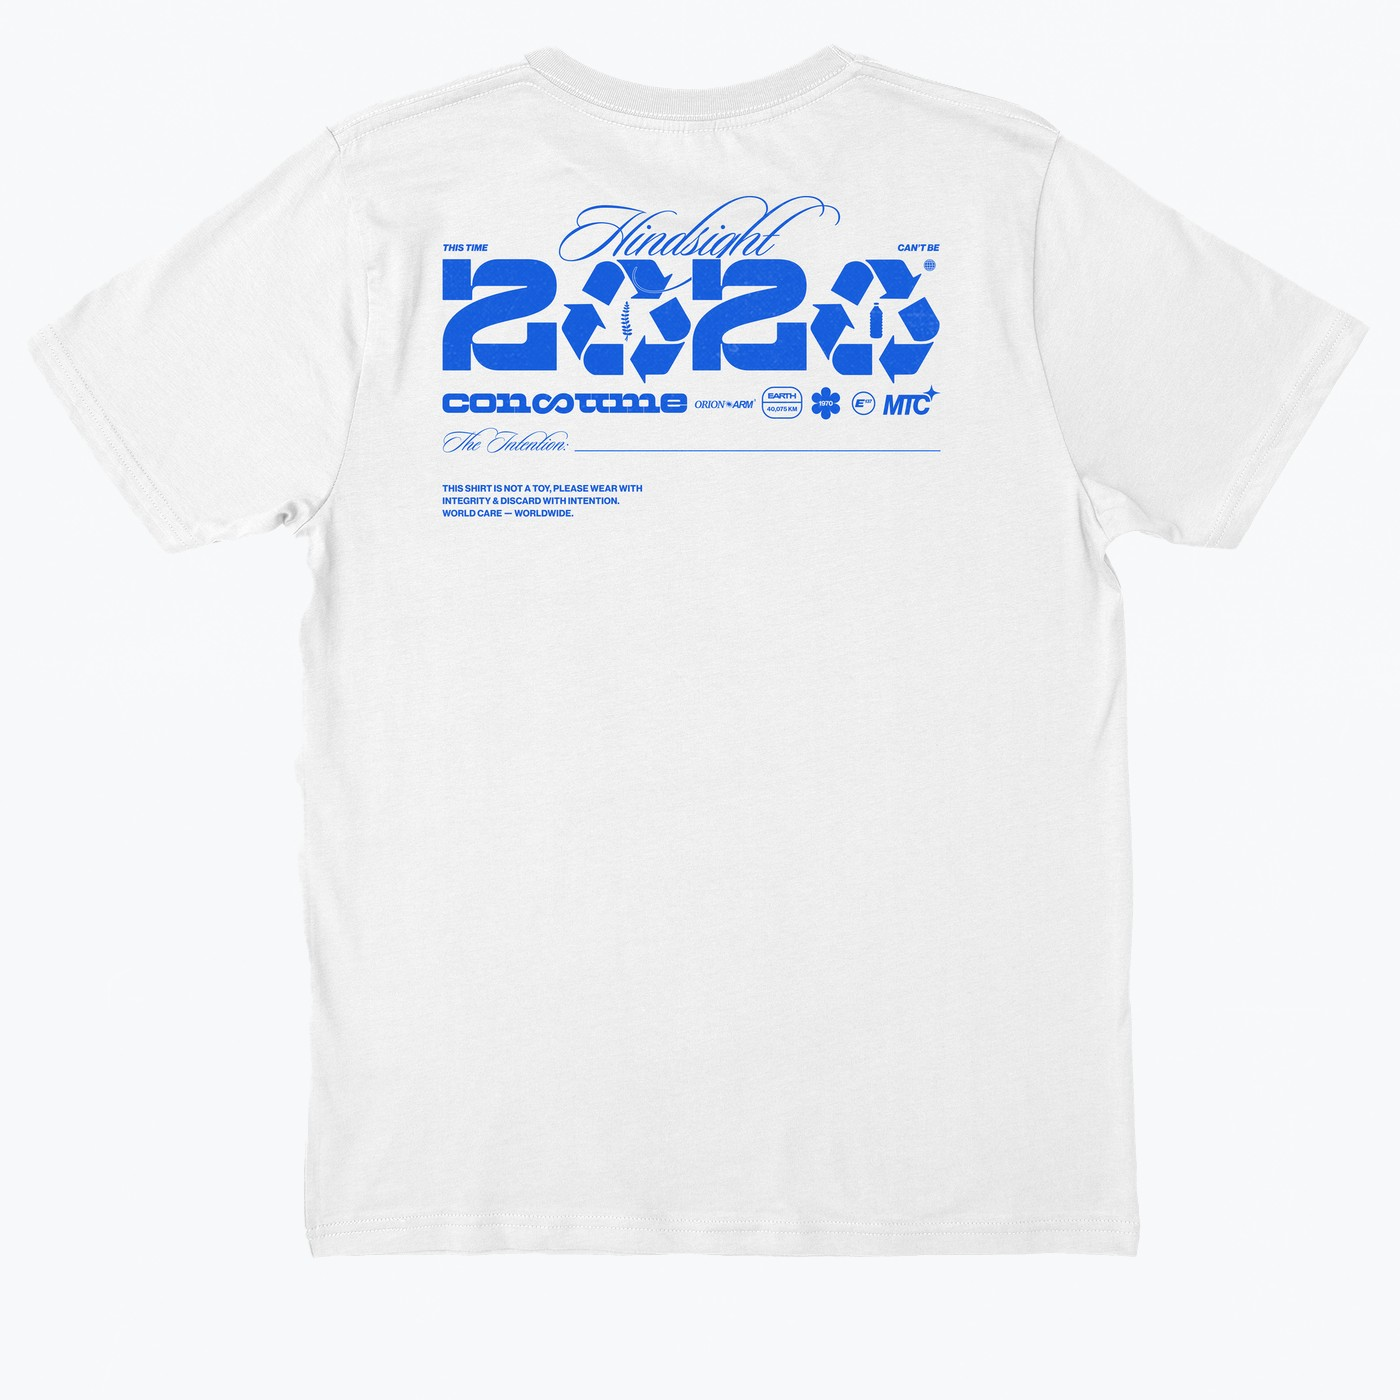 myles-thompson-1-back-hindsight-2020.png